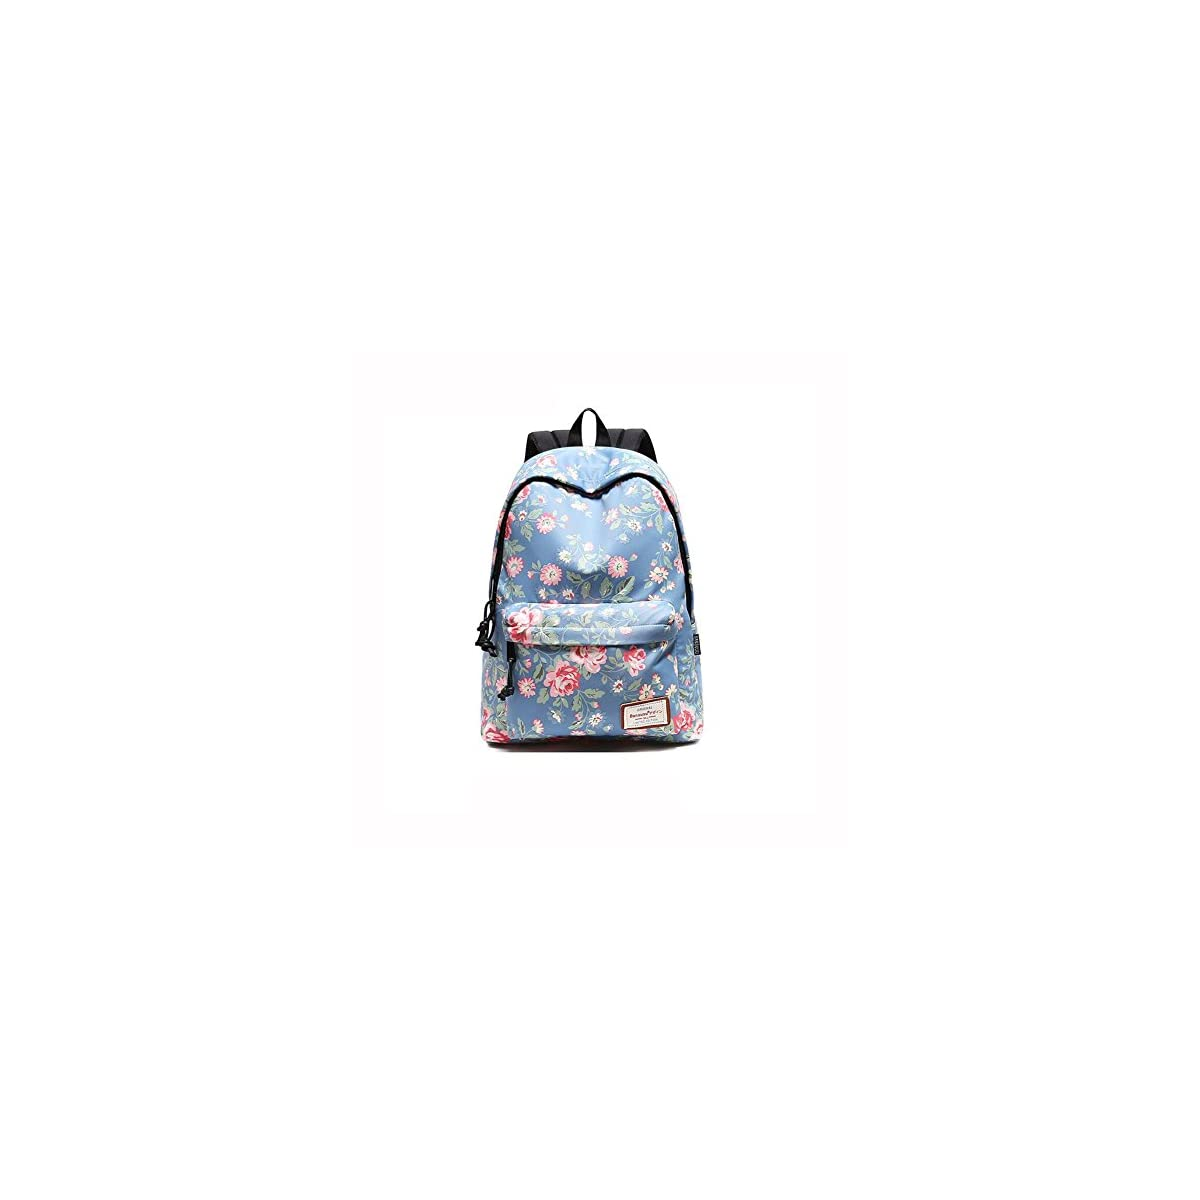 51JzGK4JODL. SS1200  - Beibao HQ Mochila Floral Bolso De Escuela Moda Casual Estudiante Viaje Caminata Azul Claro